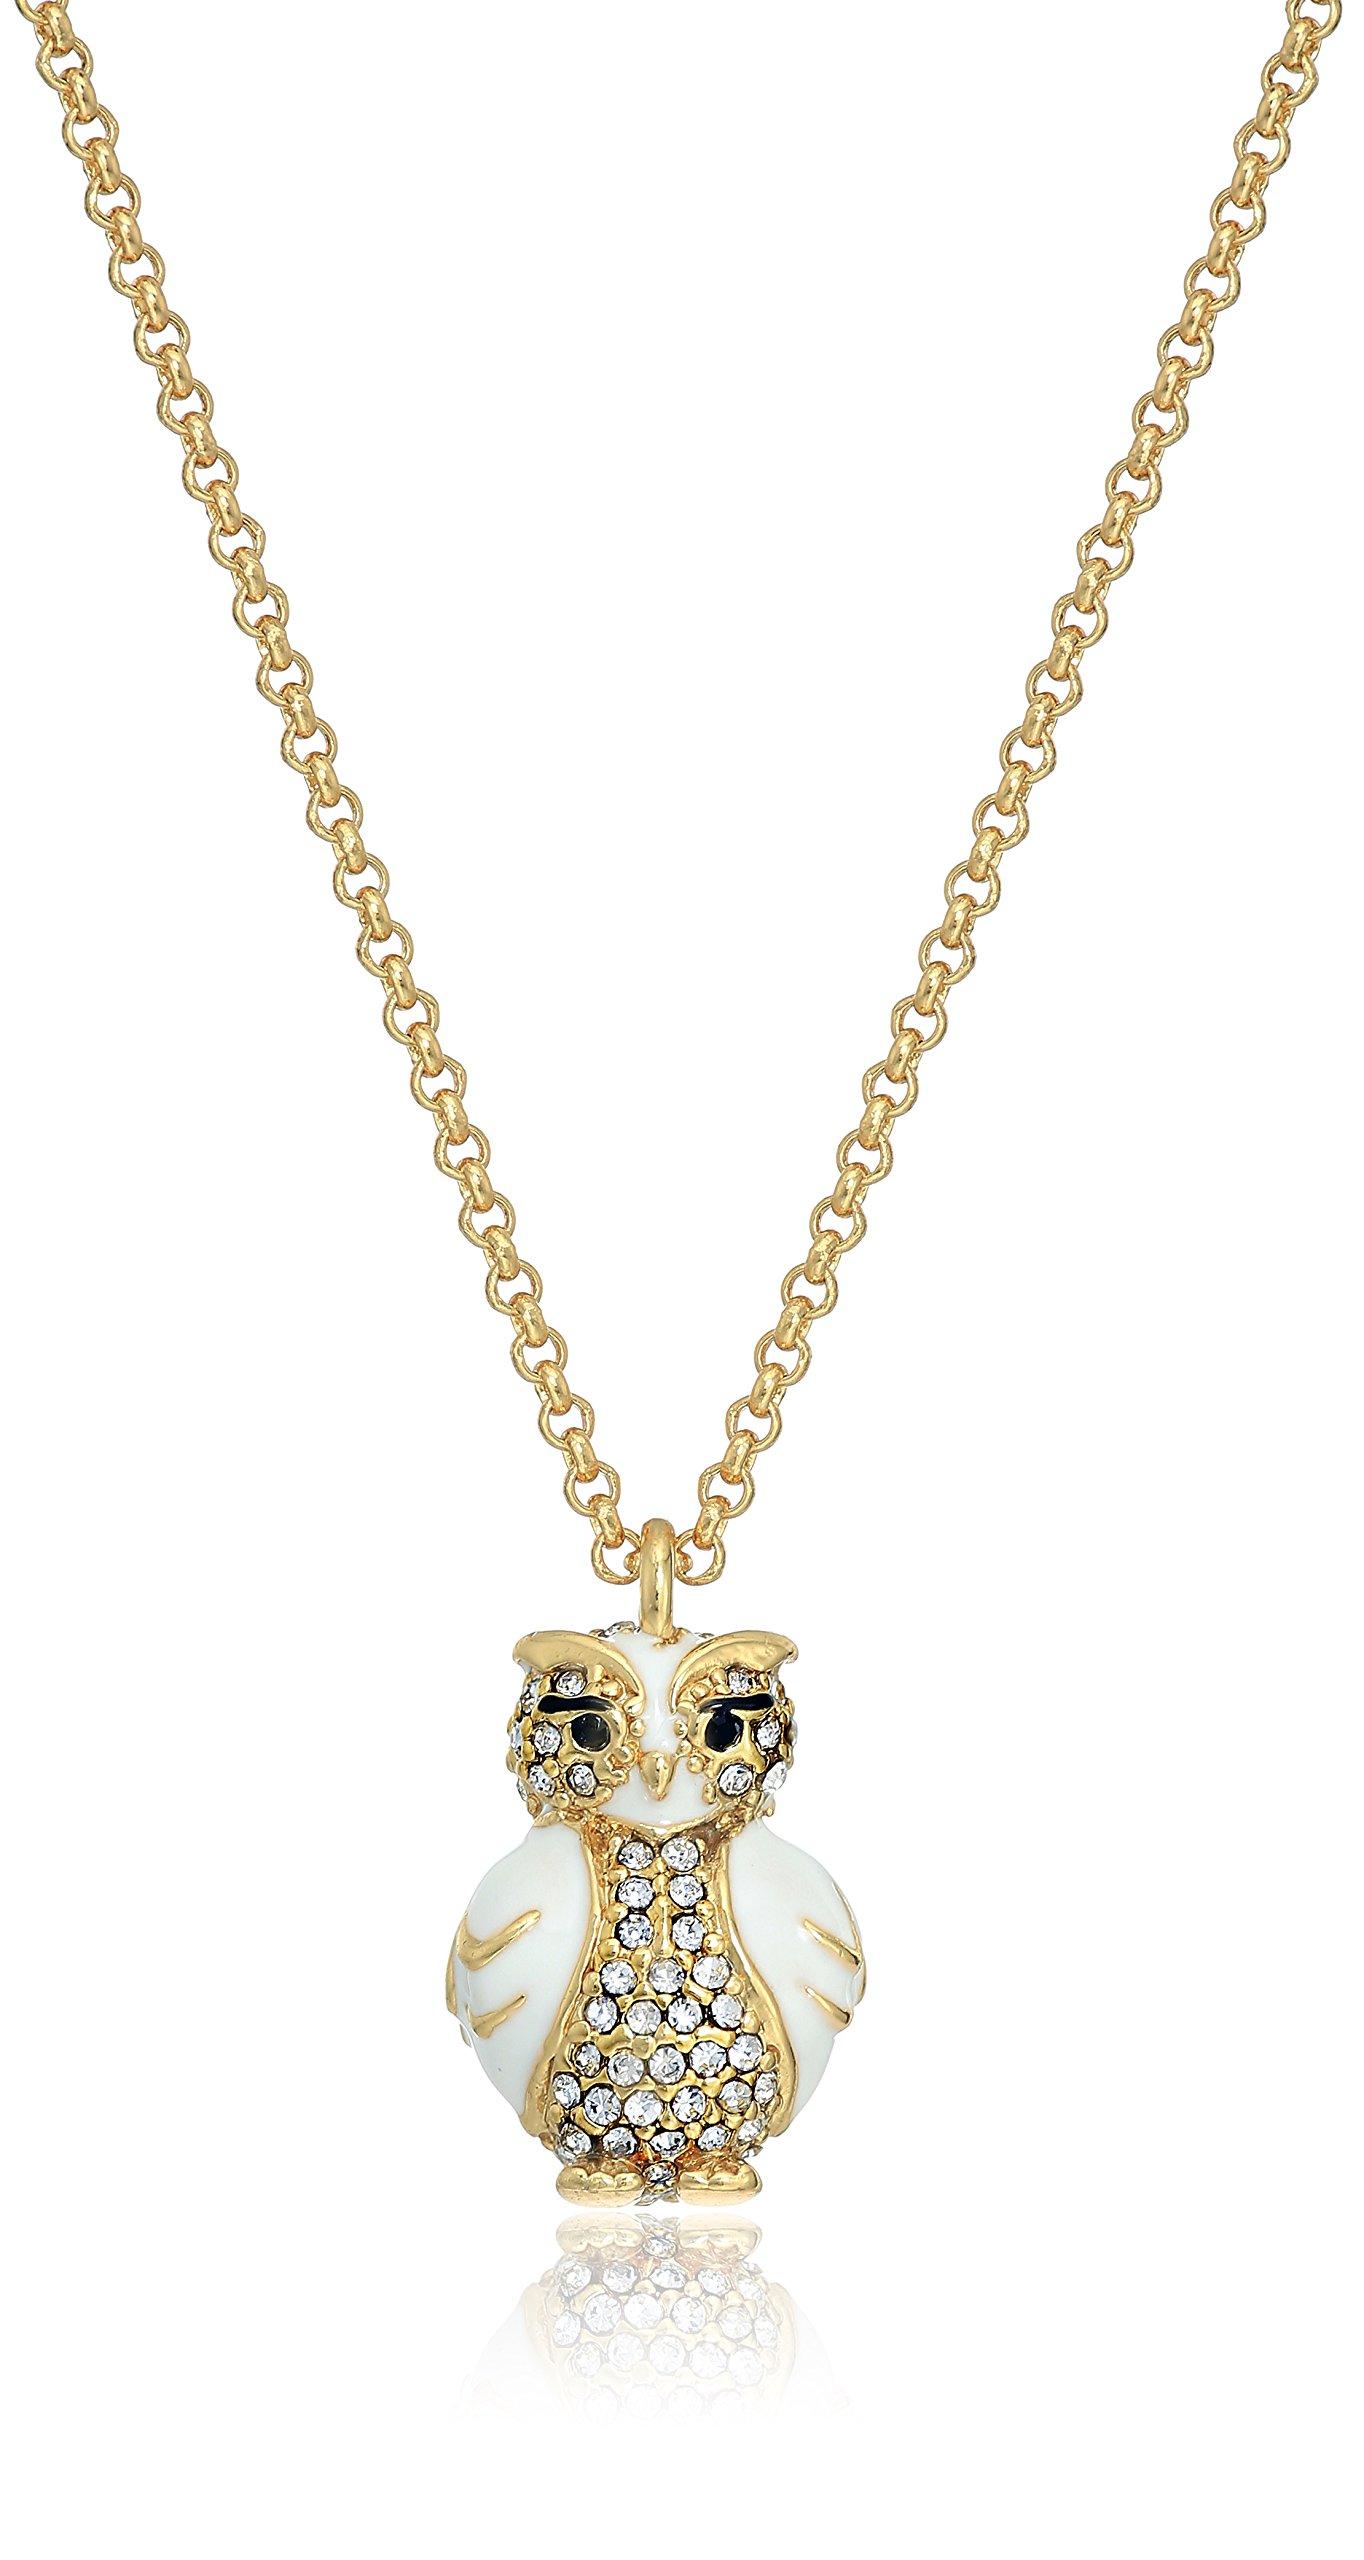 Kate Spade New York Star Bright Owl Mini Pendant Necklace